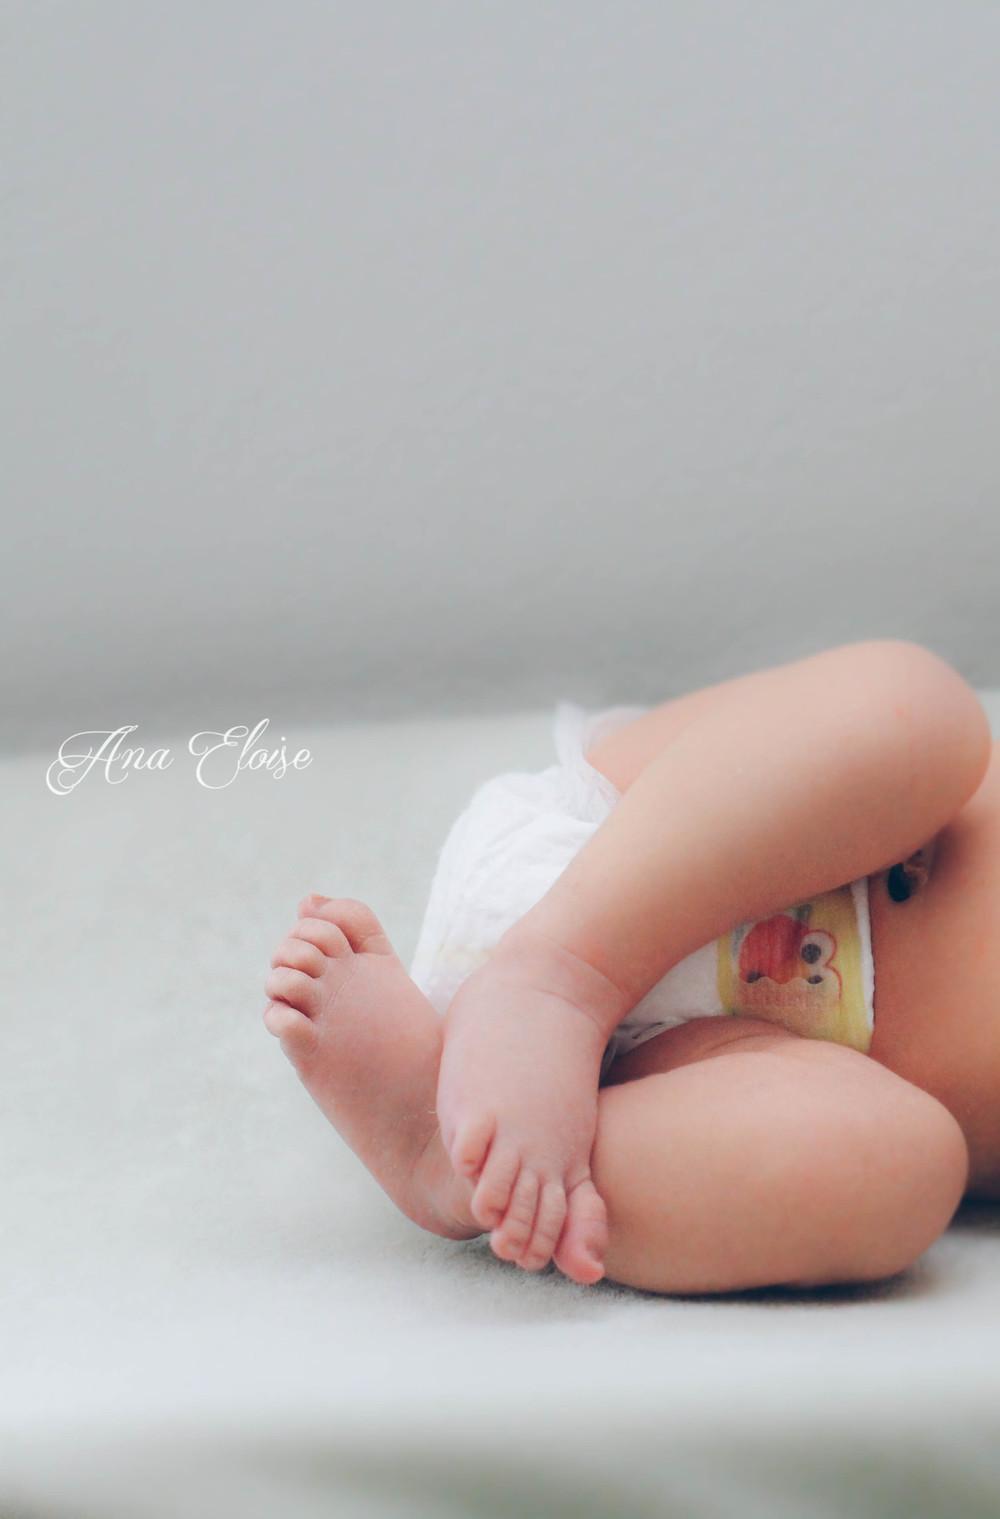 Ana_Eloise_Newborn_Photography_22 (1 of 1).jpg